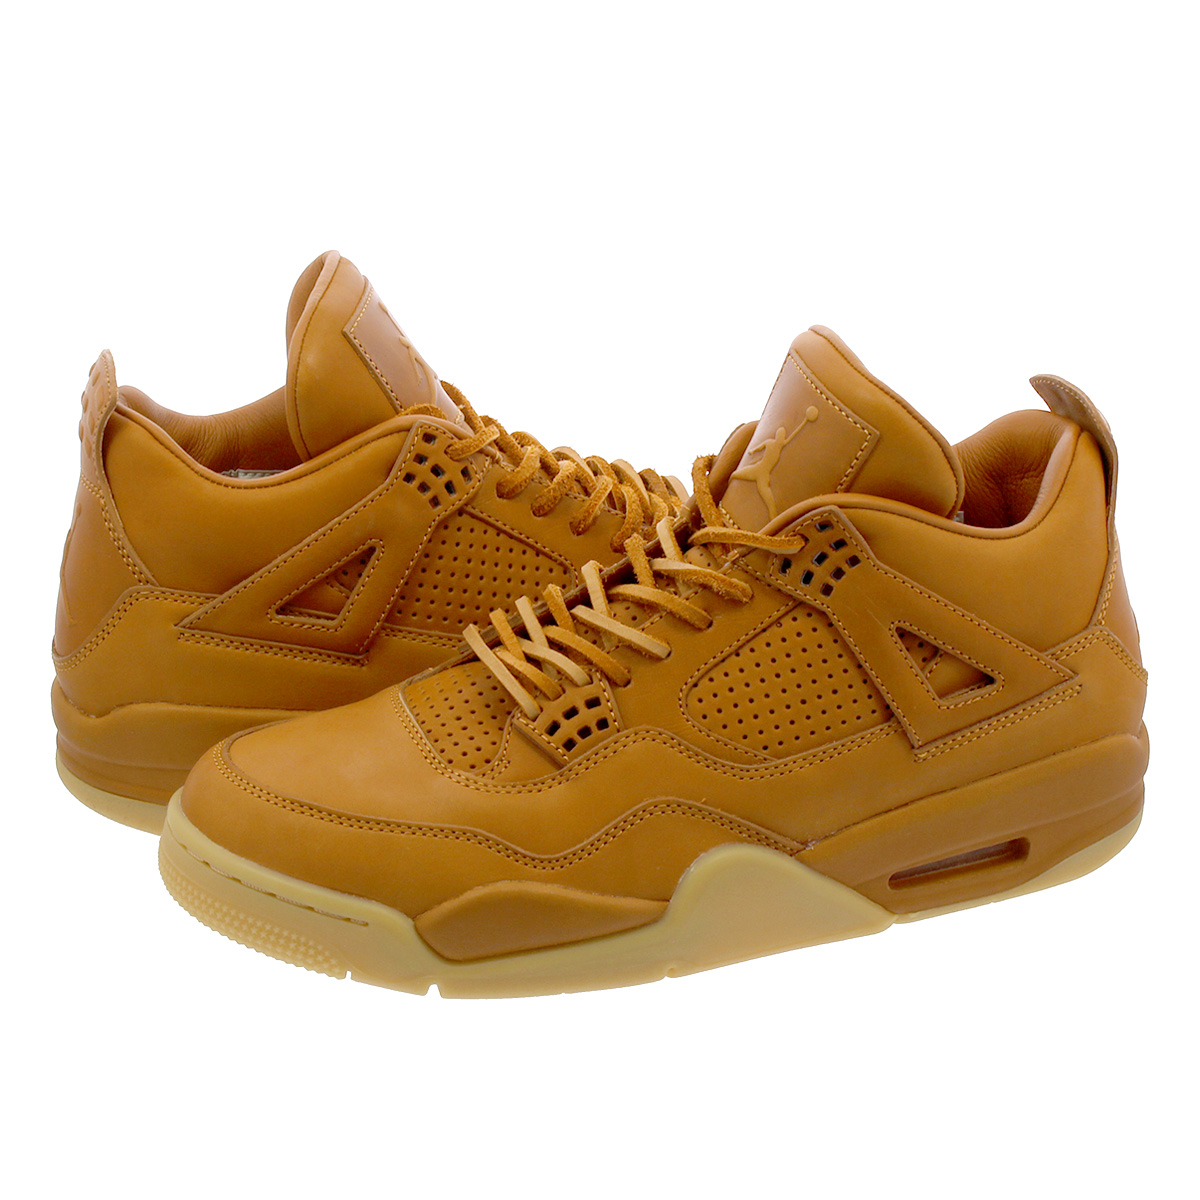 newest 5a4f5 a9858 NIKE AIR JORDAN 4 PREMIUM Nike air Jordan 4 nostalgic premium GINGER/GUM  YELLOW 819,139-205